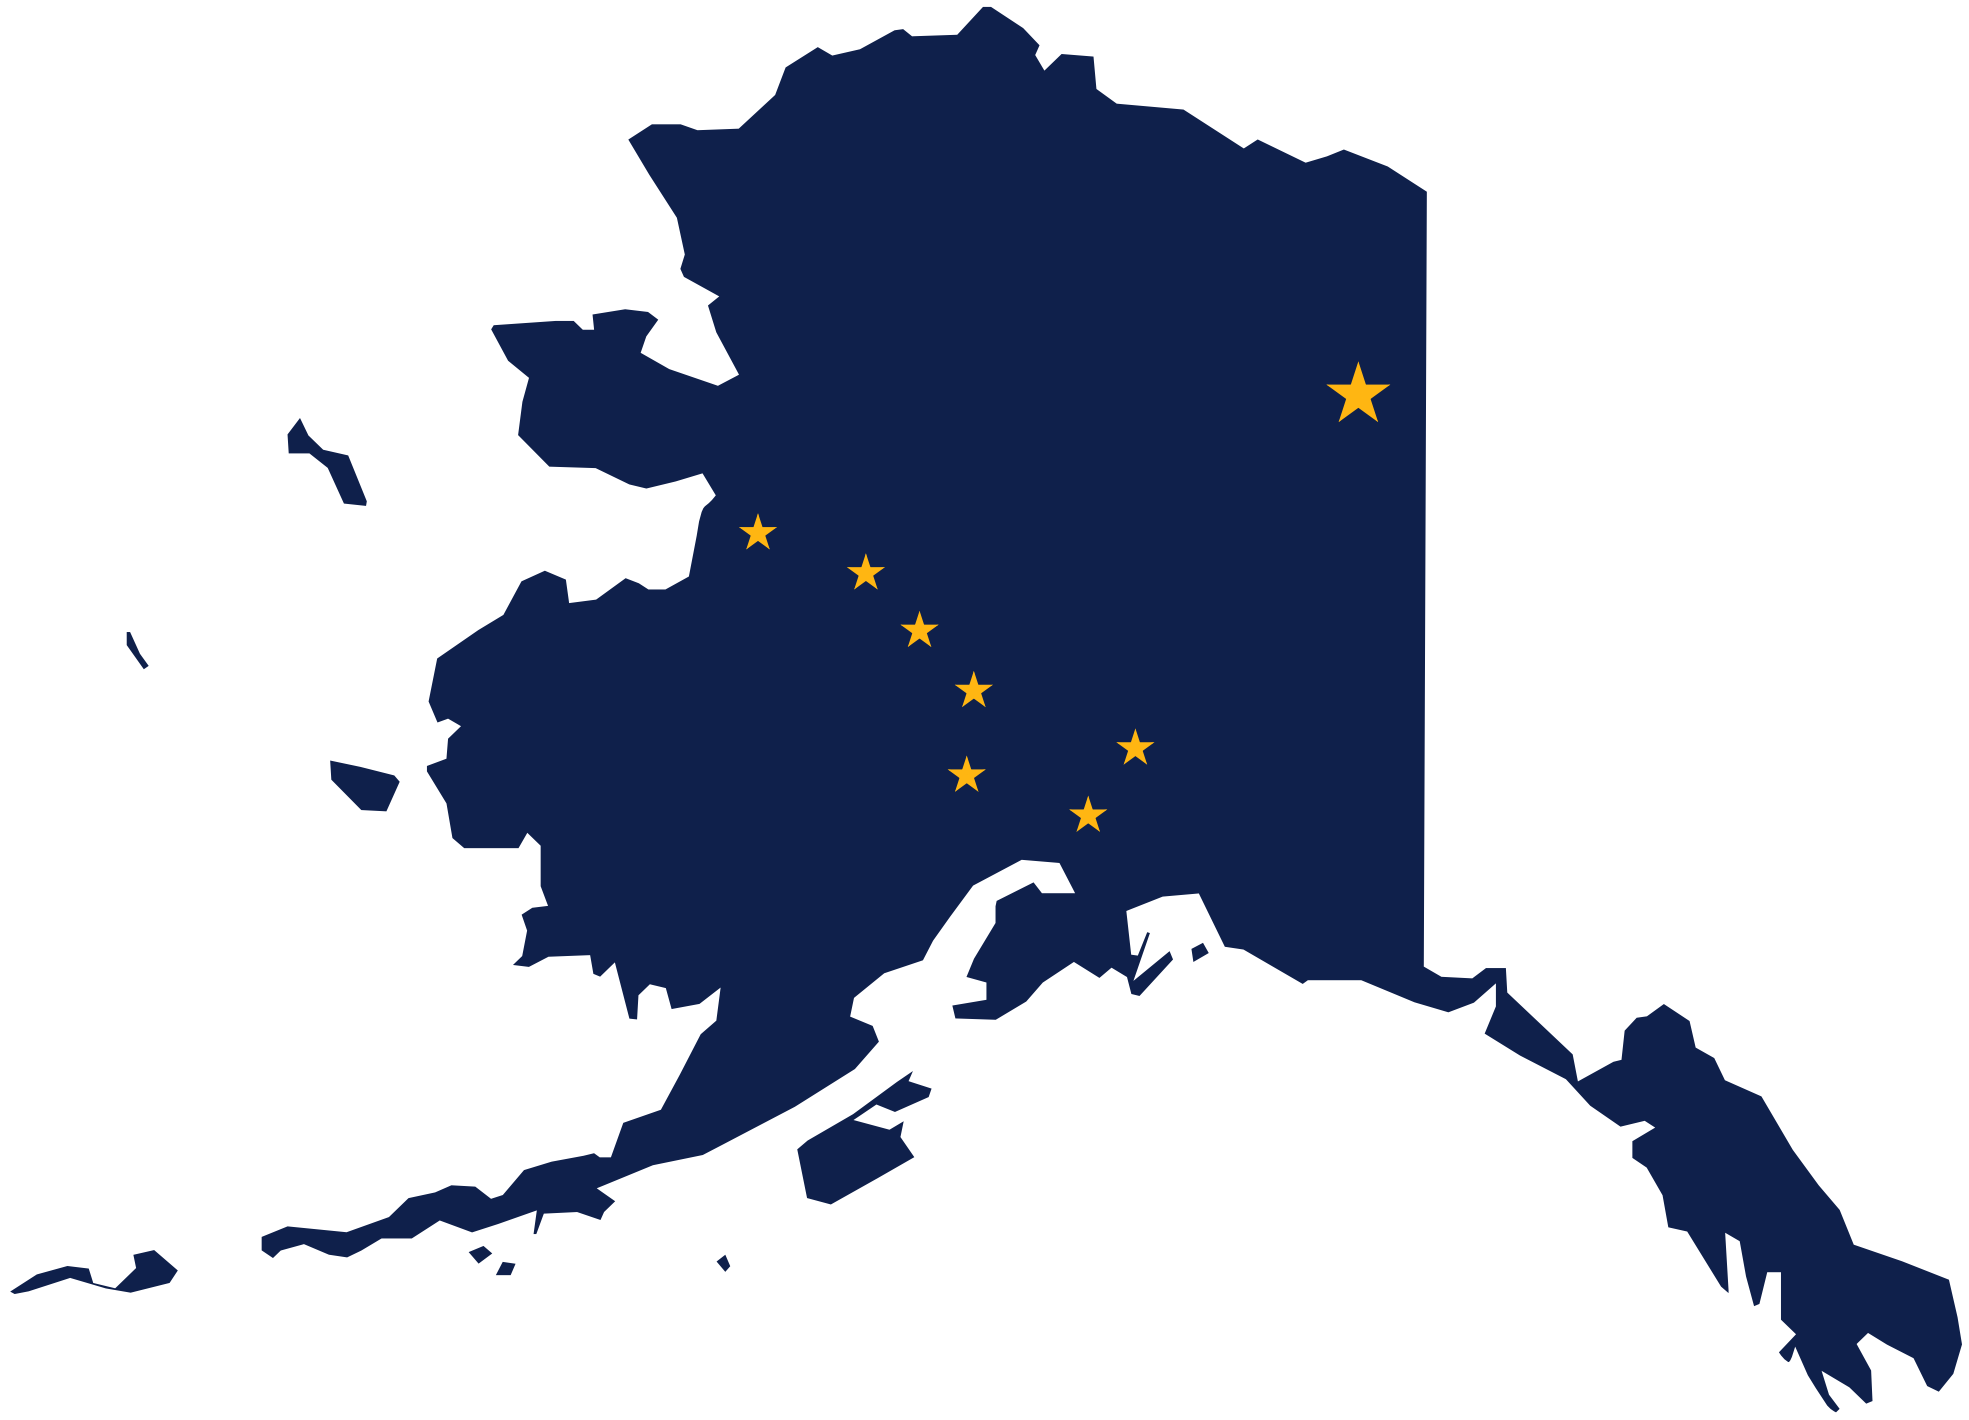 Alaska Clipart Flag Map Of Alaska 1969px-Alaska Clipart Flag Map Of Alaska 1969px Png-13